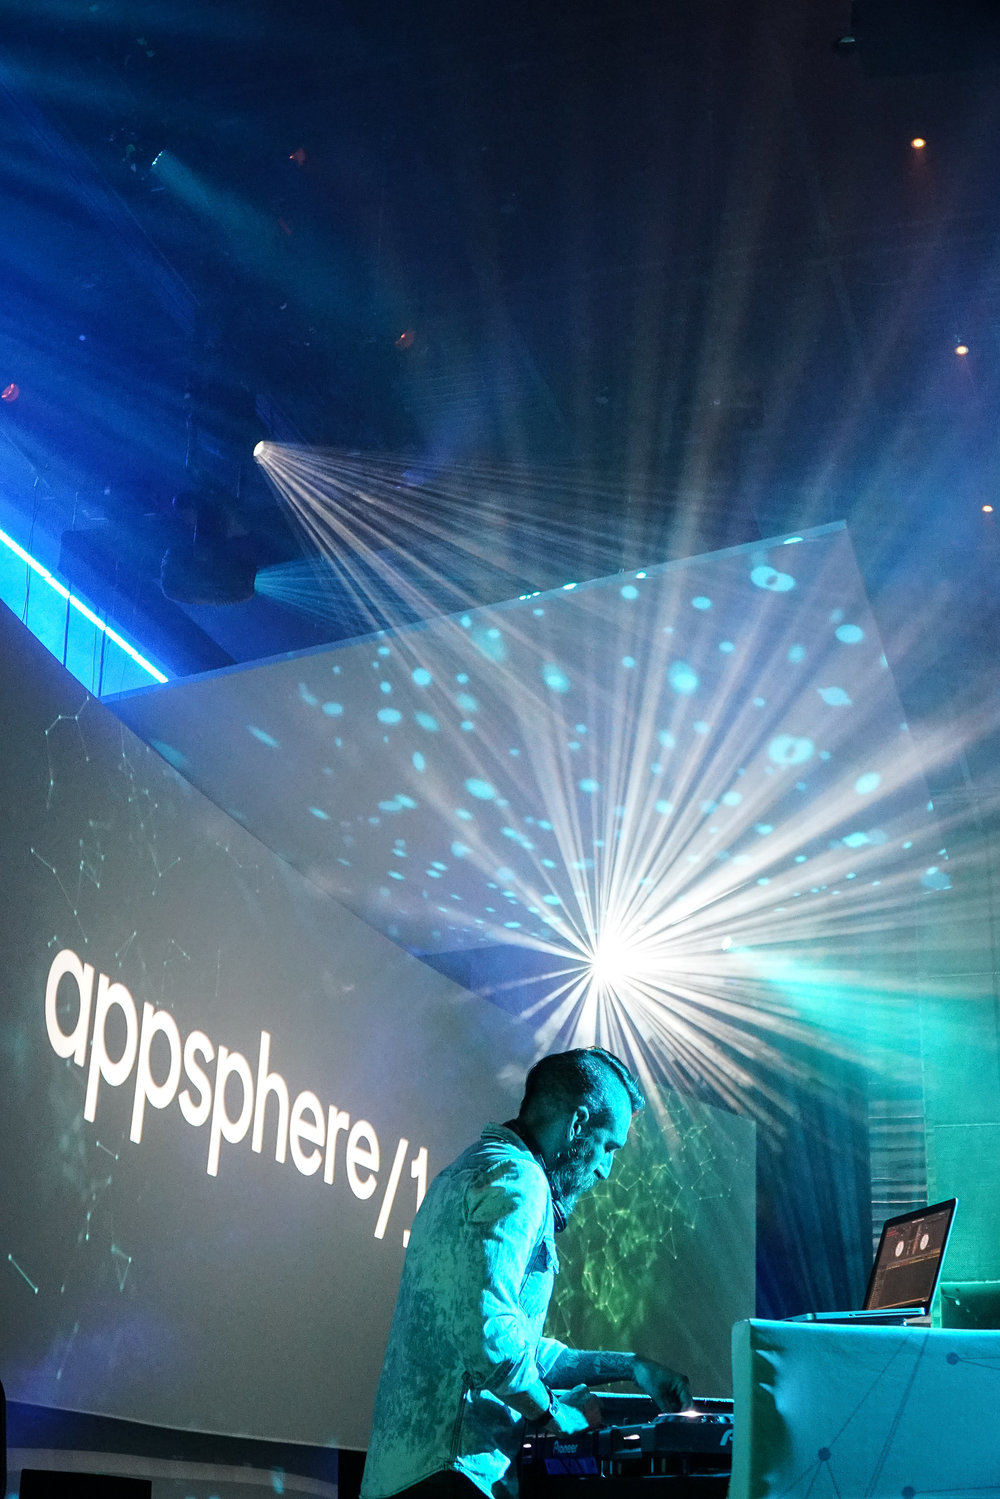 2016-CG-Appsphere-8x-420.jpg